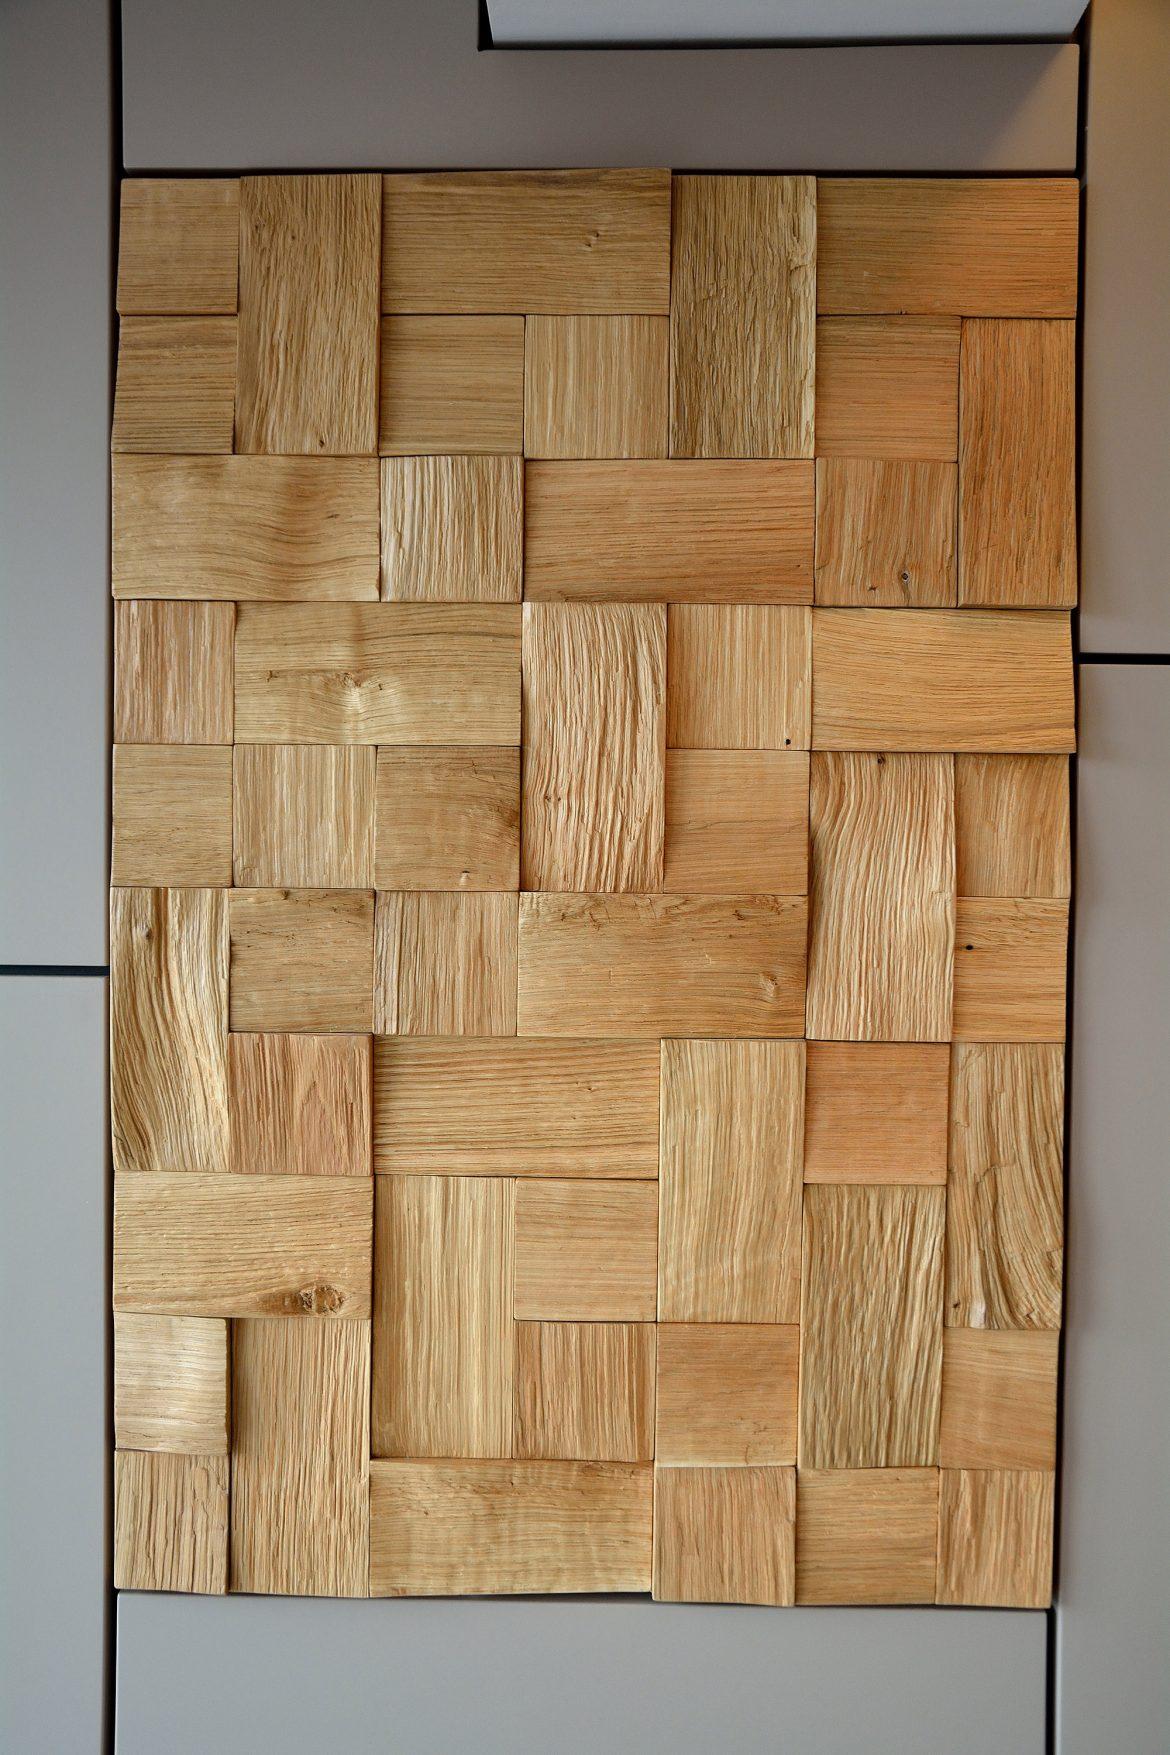 Detaliu placa de Lemn din stejar Masiv Natur incastrata pe perete din Mdf Vopsit Mat Gri